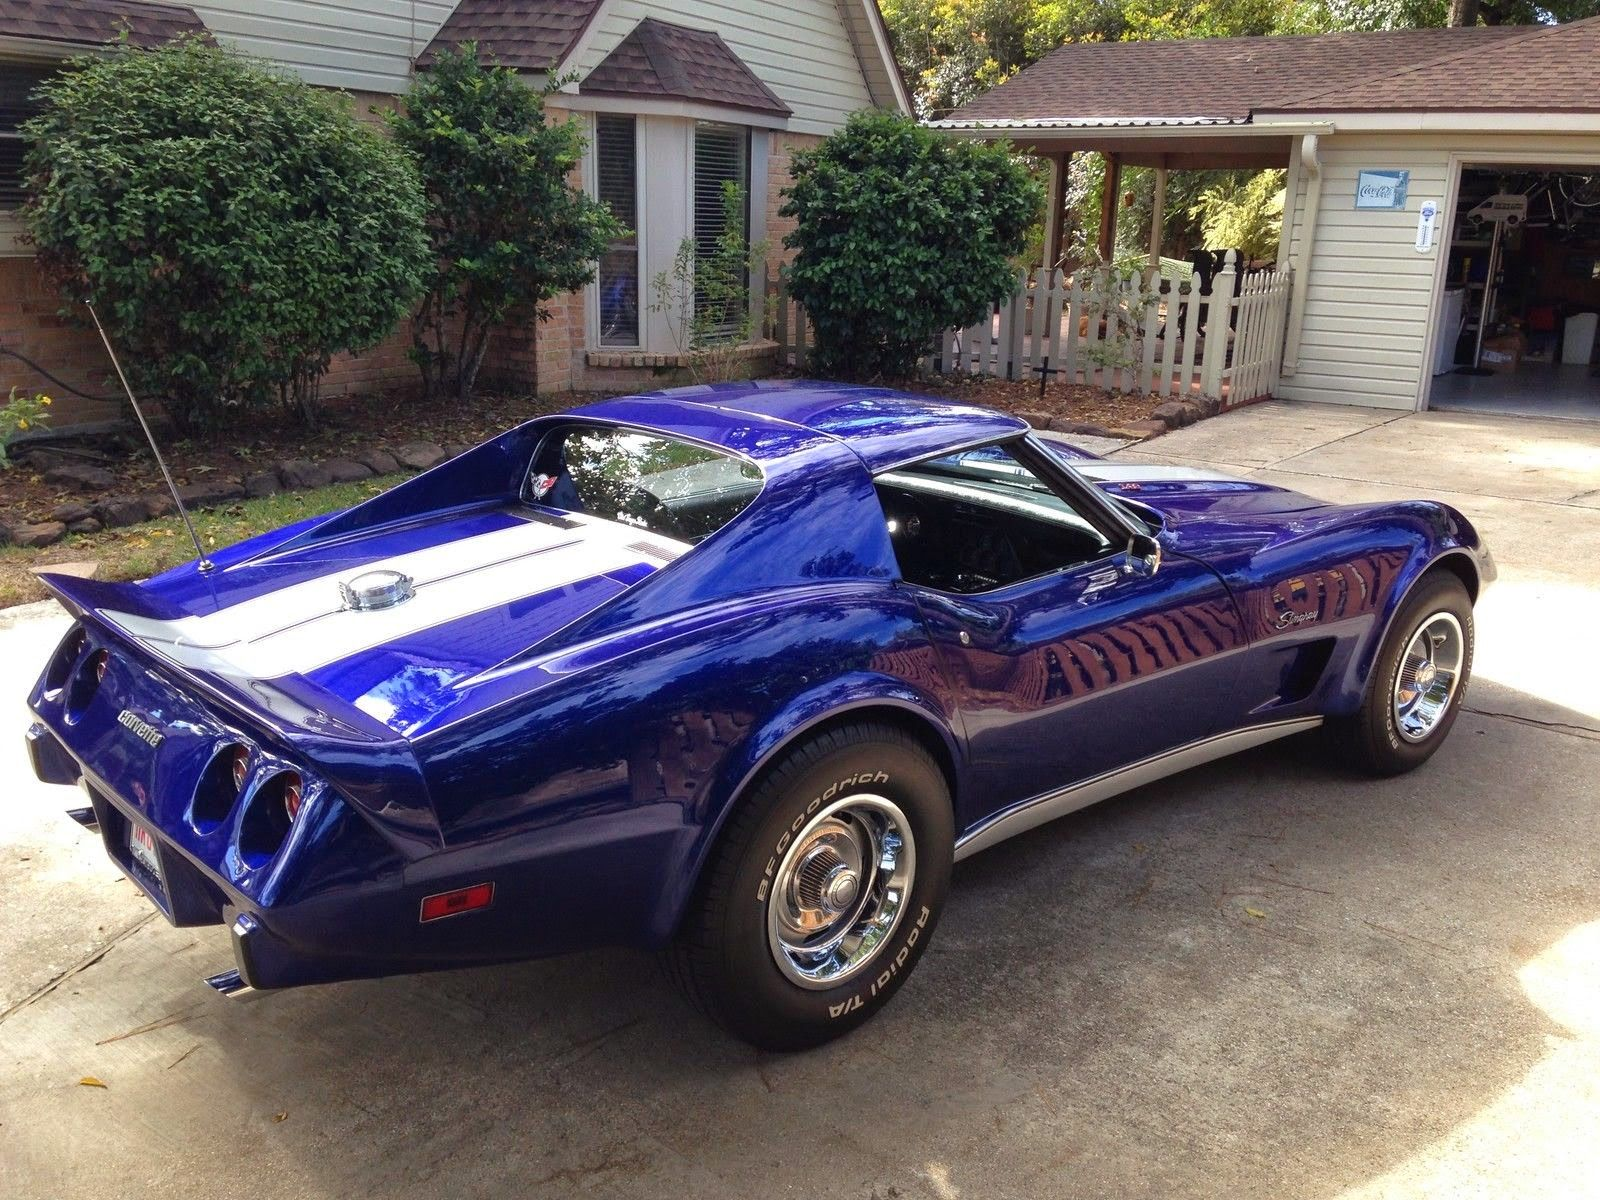 1975 Corvette Convertible For Sale in Pennsylvania | 1975 Blue ...